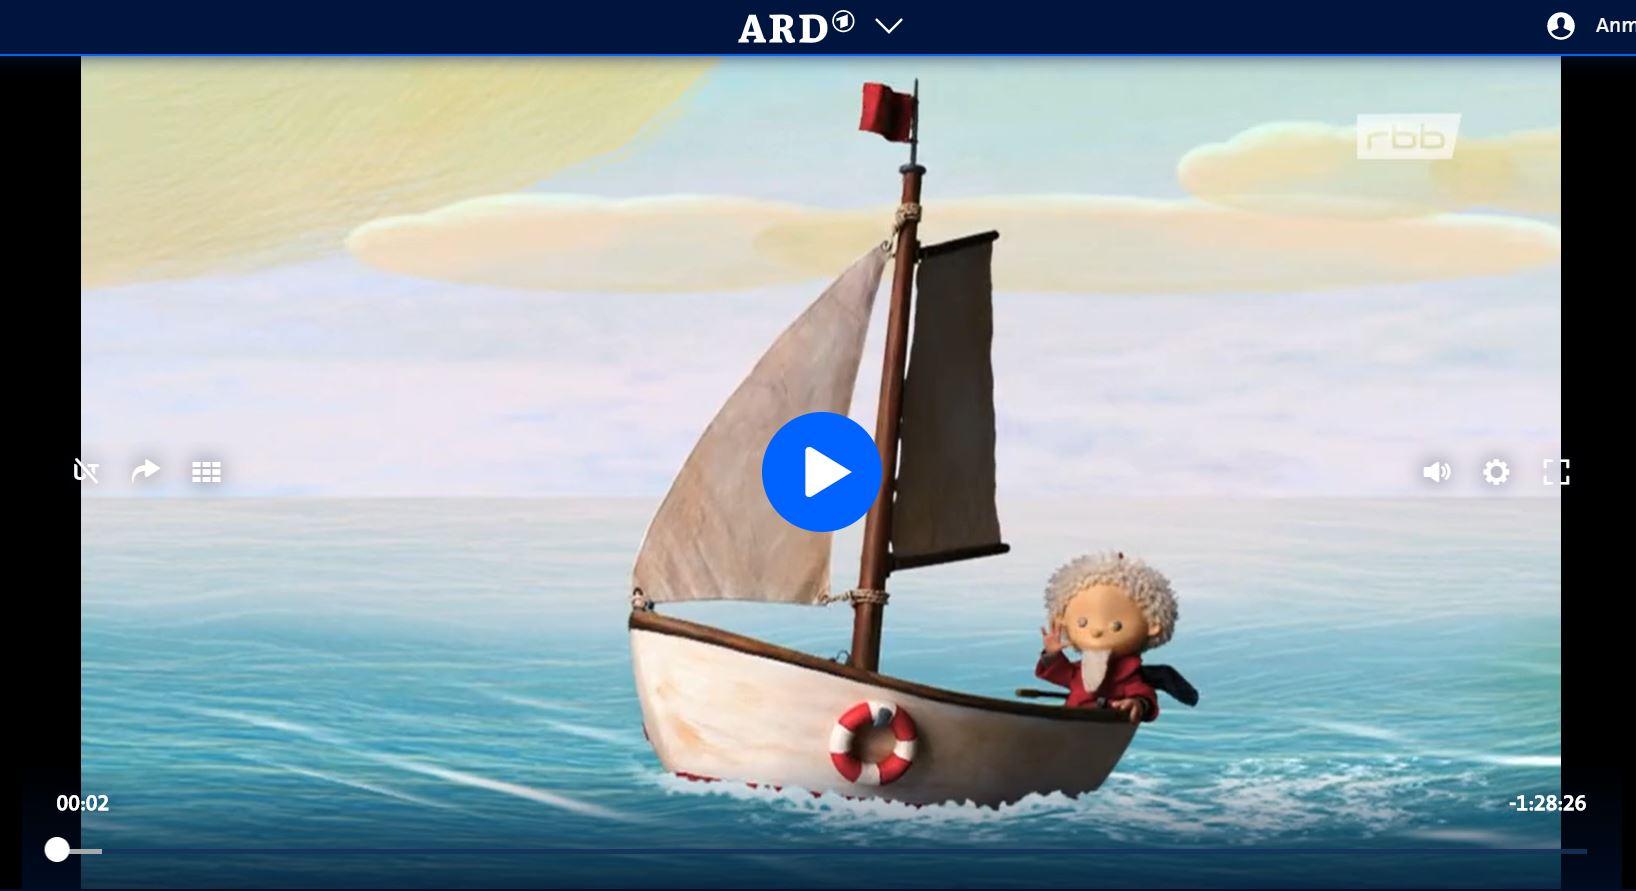 RBB-Doku: Sandmännchen - 60 Jahre süße Träume